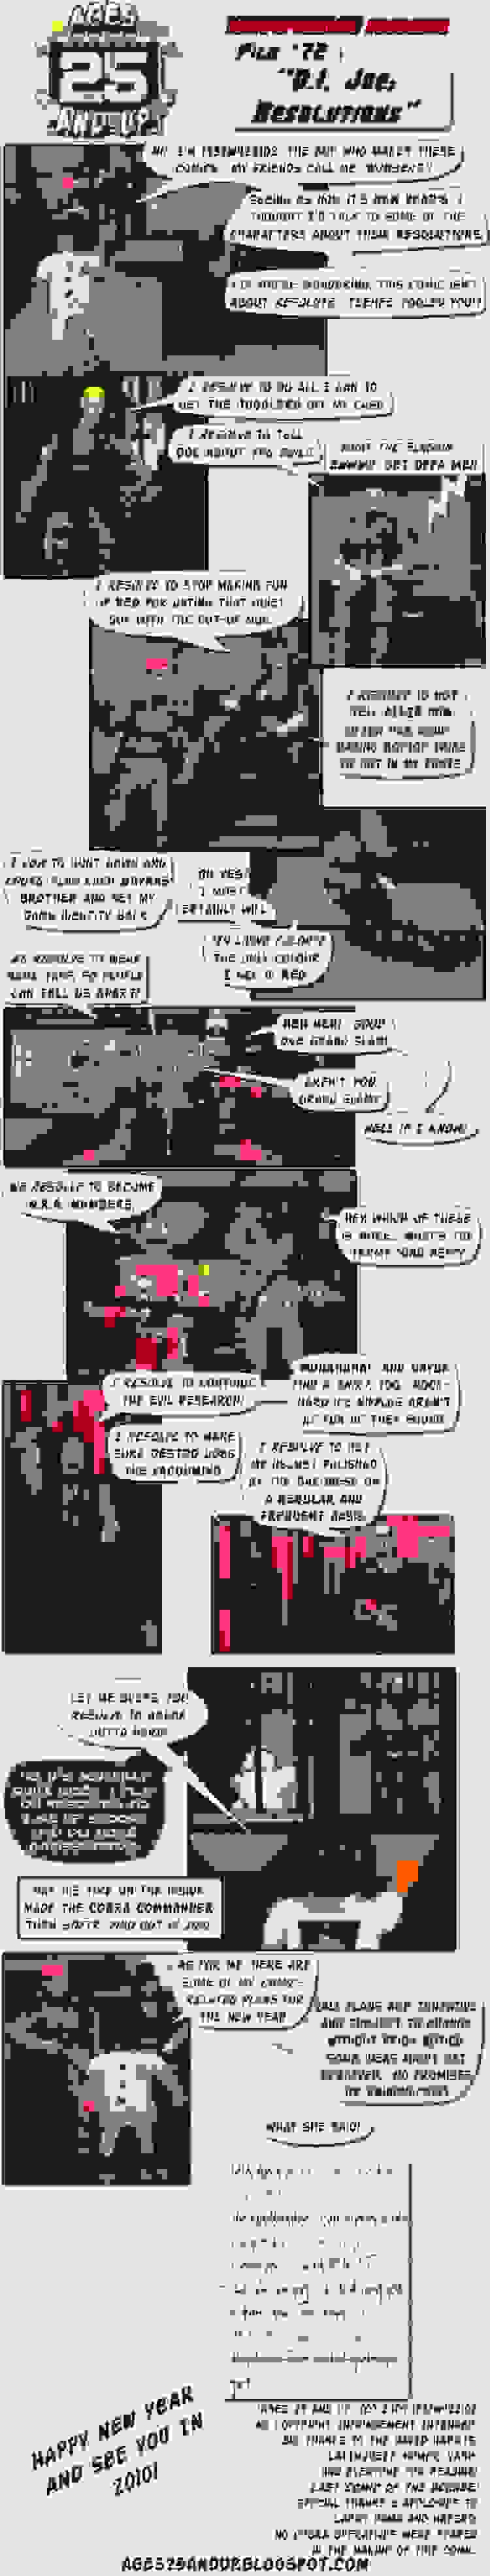 G.I.Joe: Resolutions! Gijoe_11